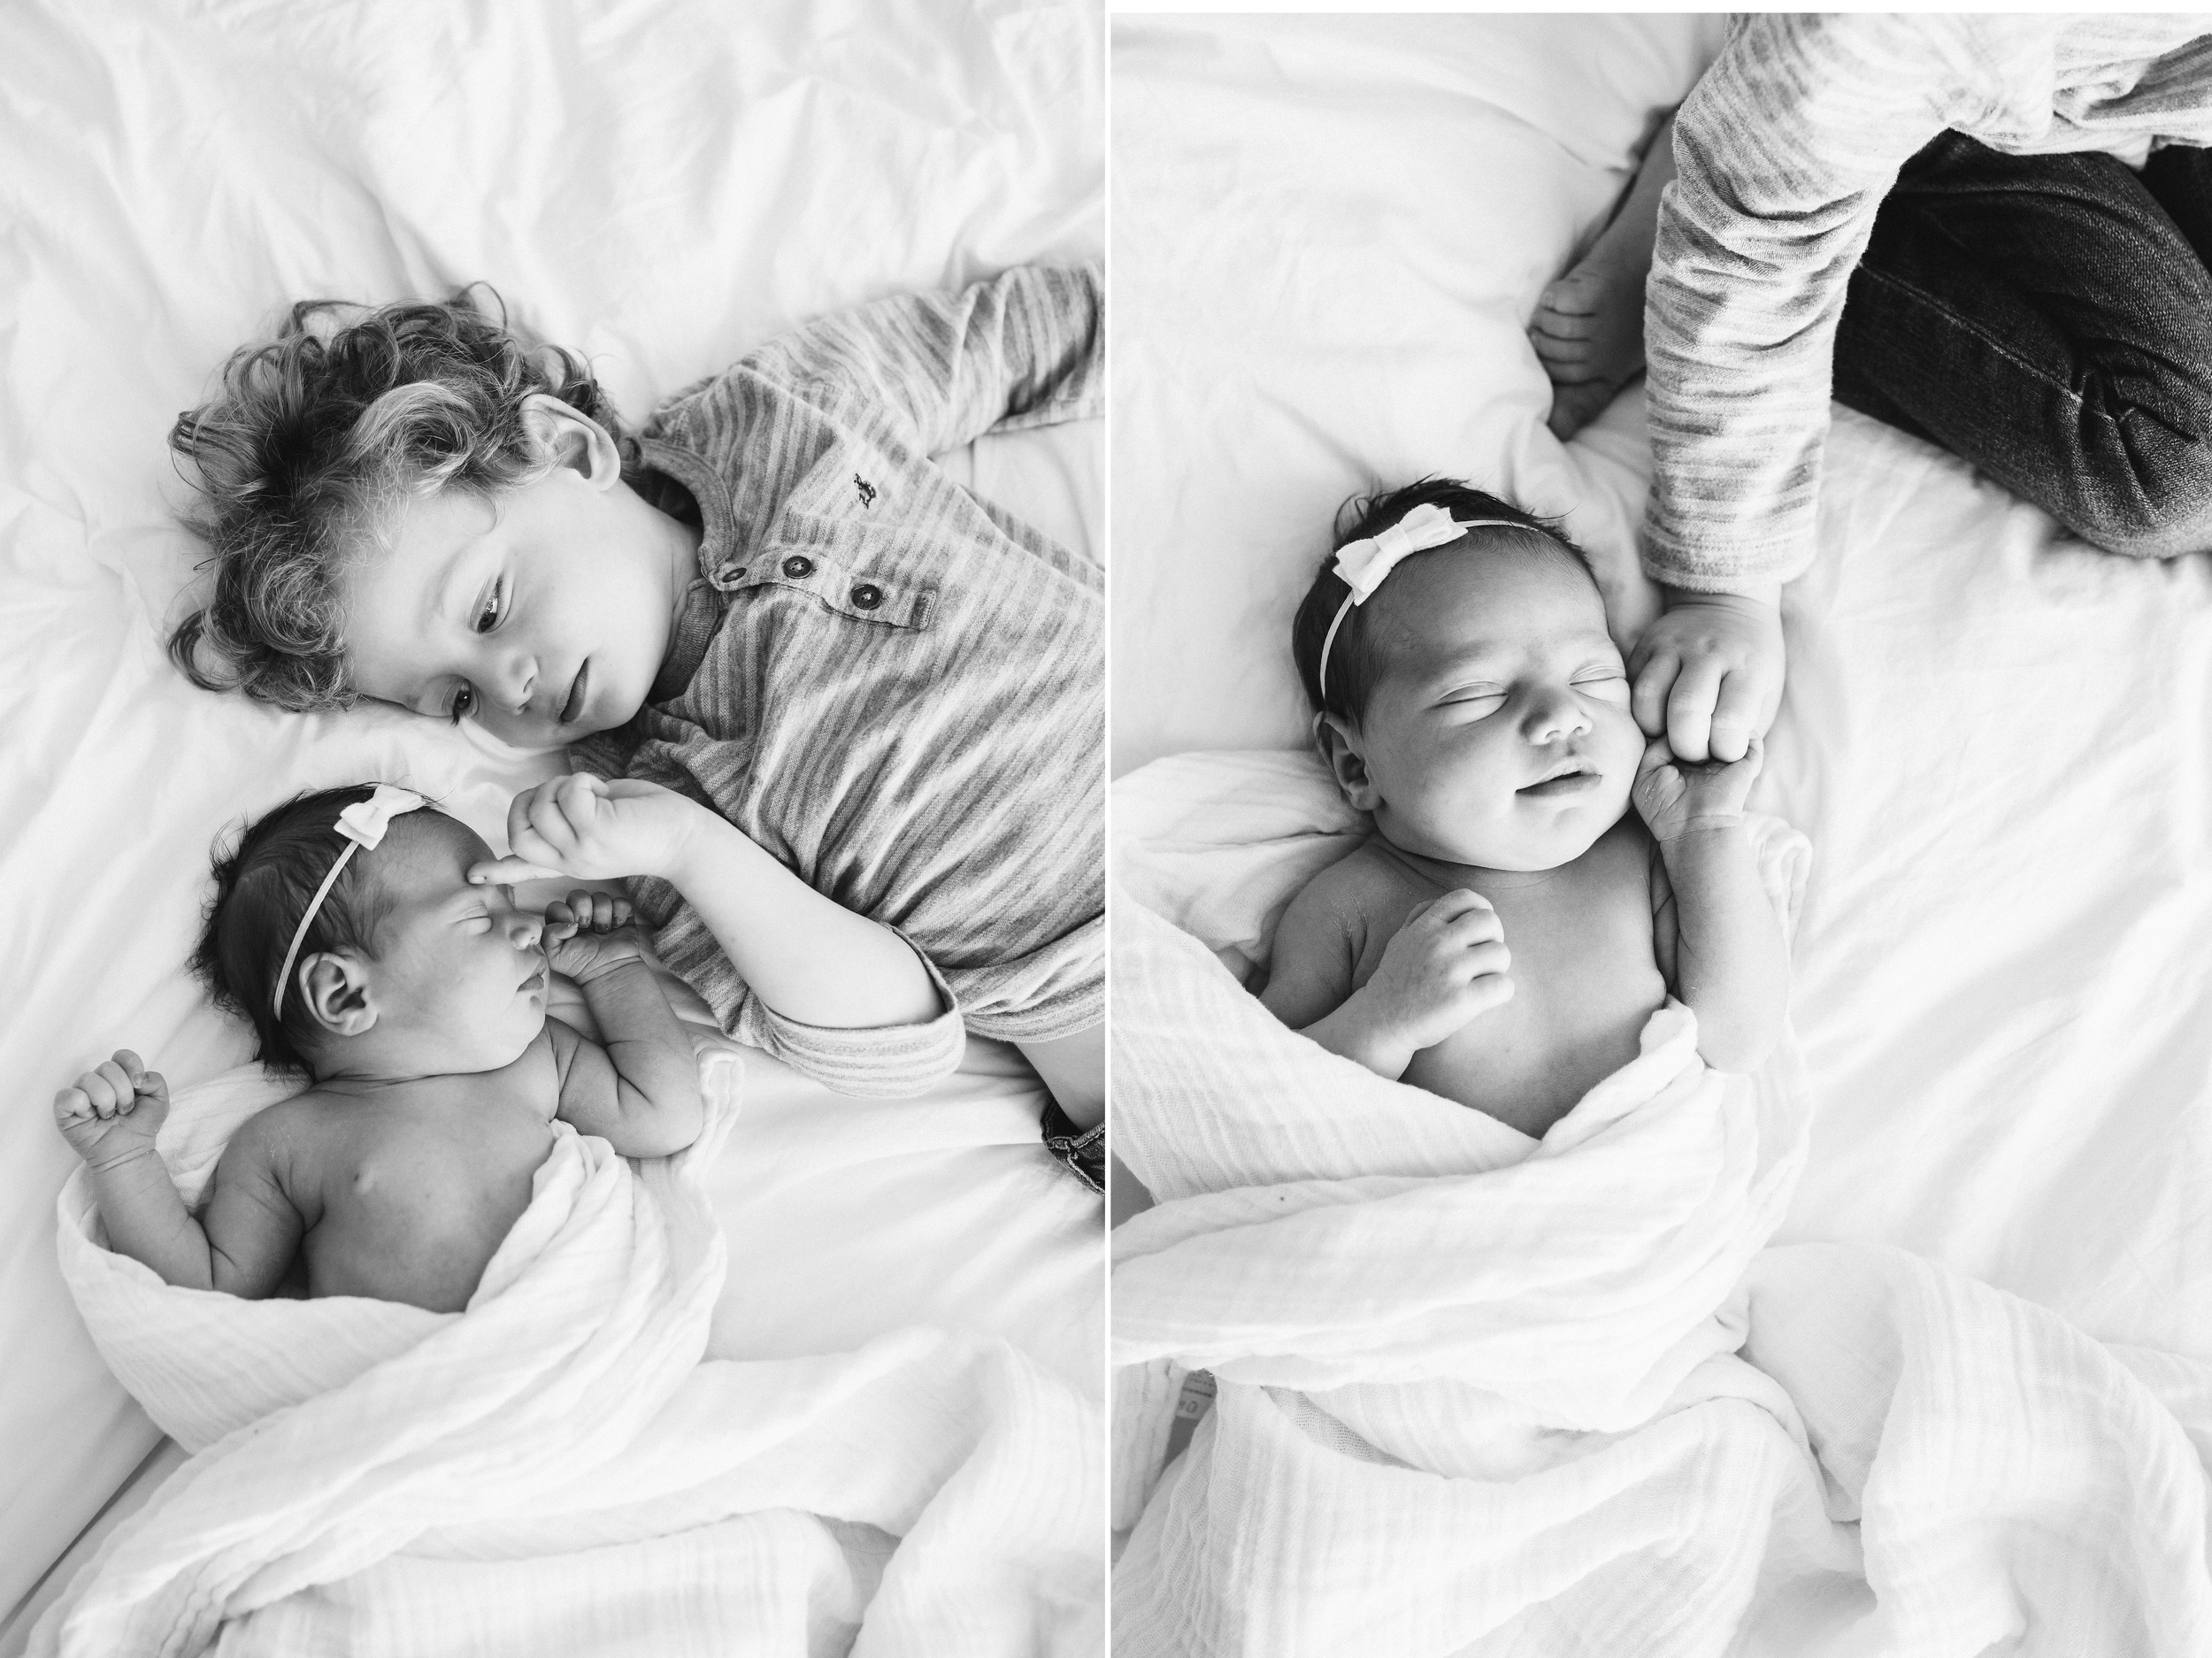 brooklyn-heights-newborn-photographer_nyc-1.jpg